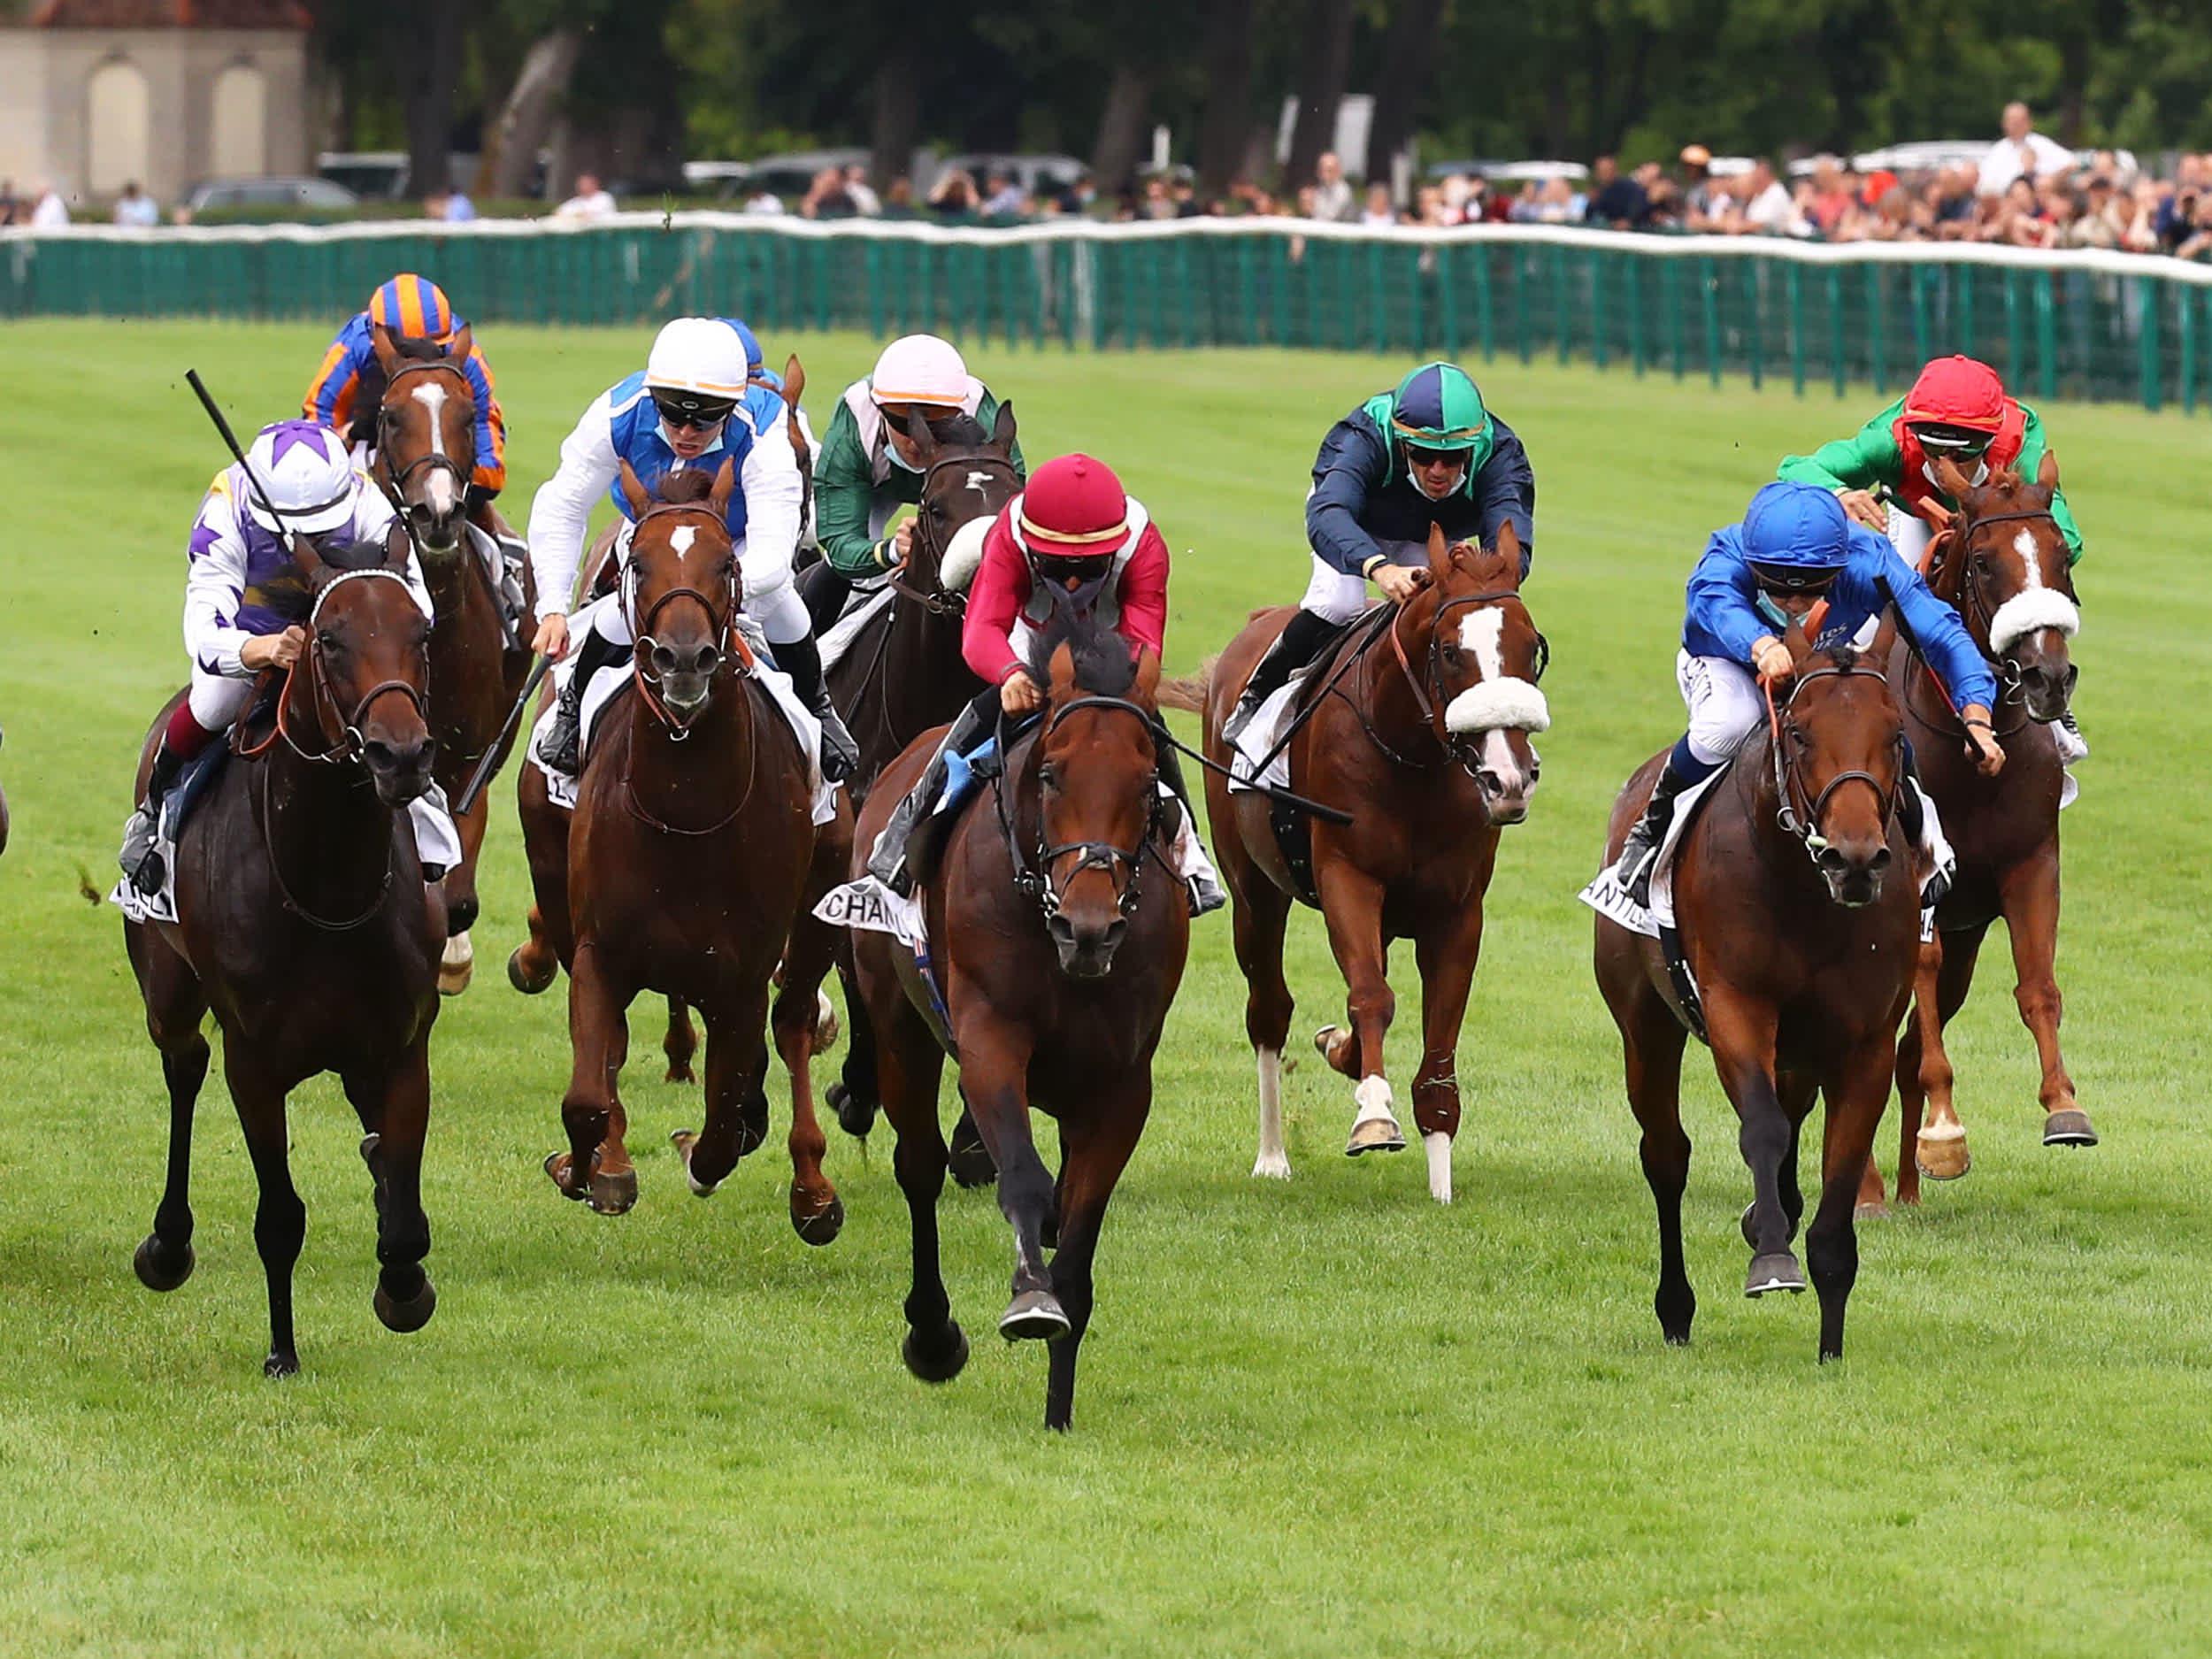 Prix du jockey club 2021 betting sites texas hold em tournament betting strategy